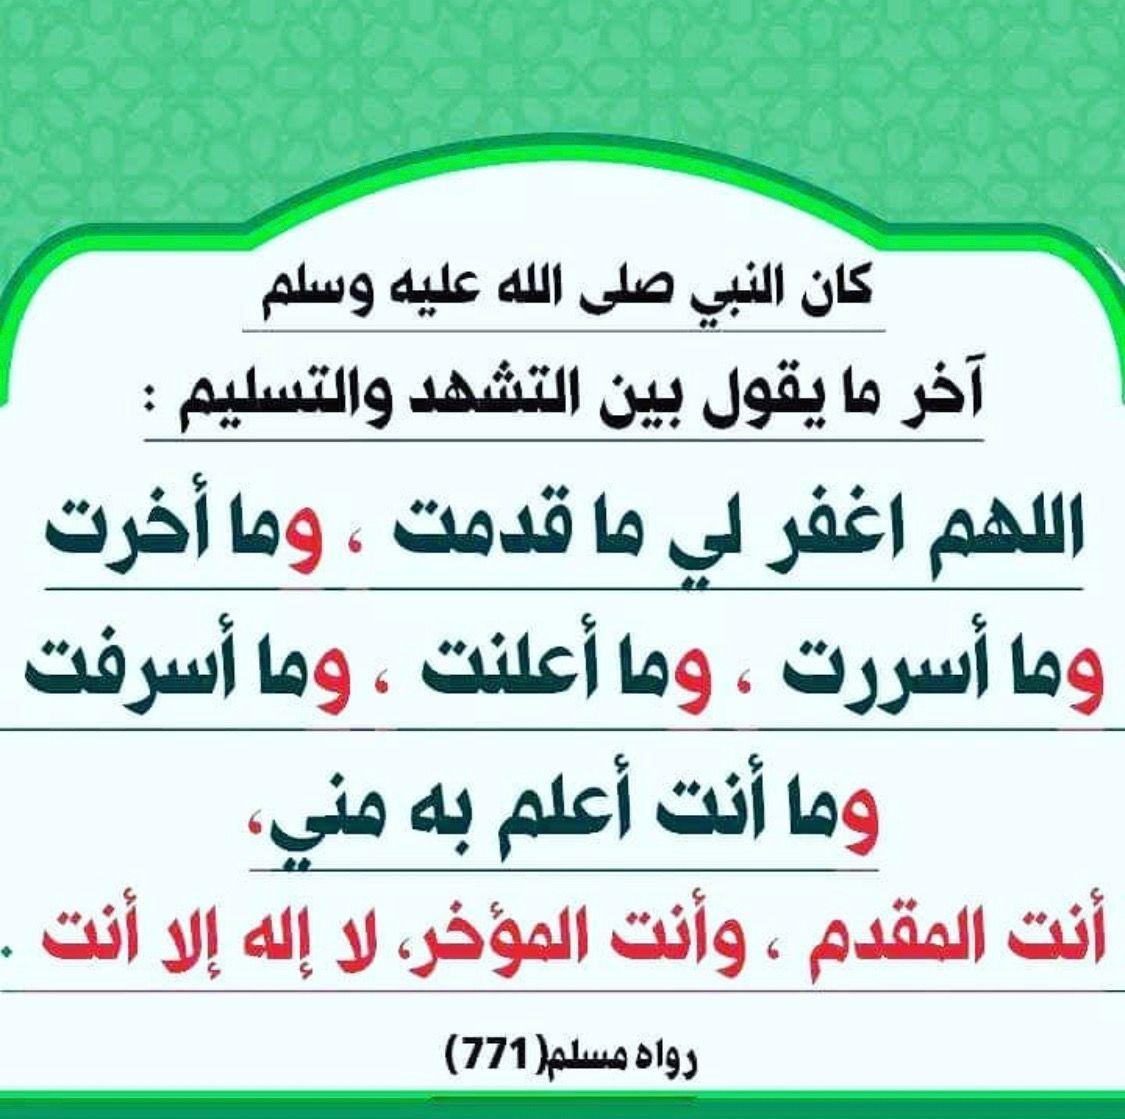 حديث صحيح آخری تشھد کے بعد دعا مسنون Quotes Hadith Peace